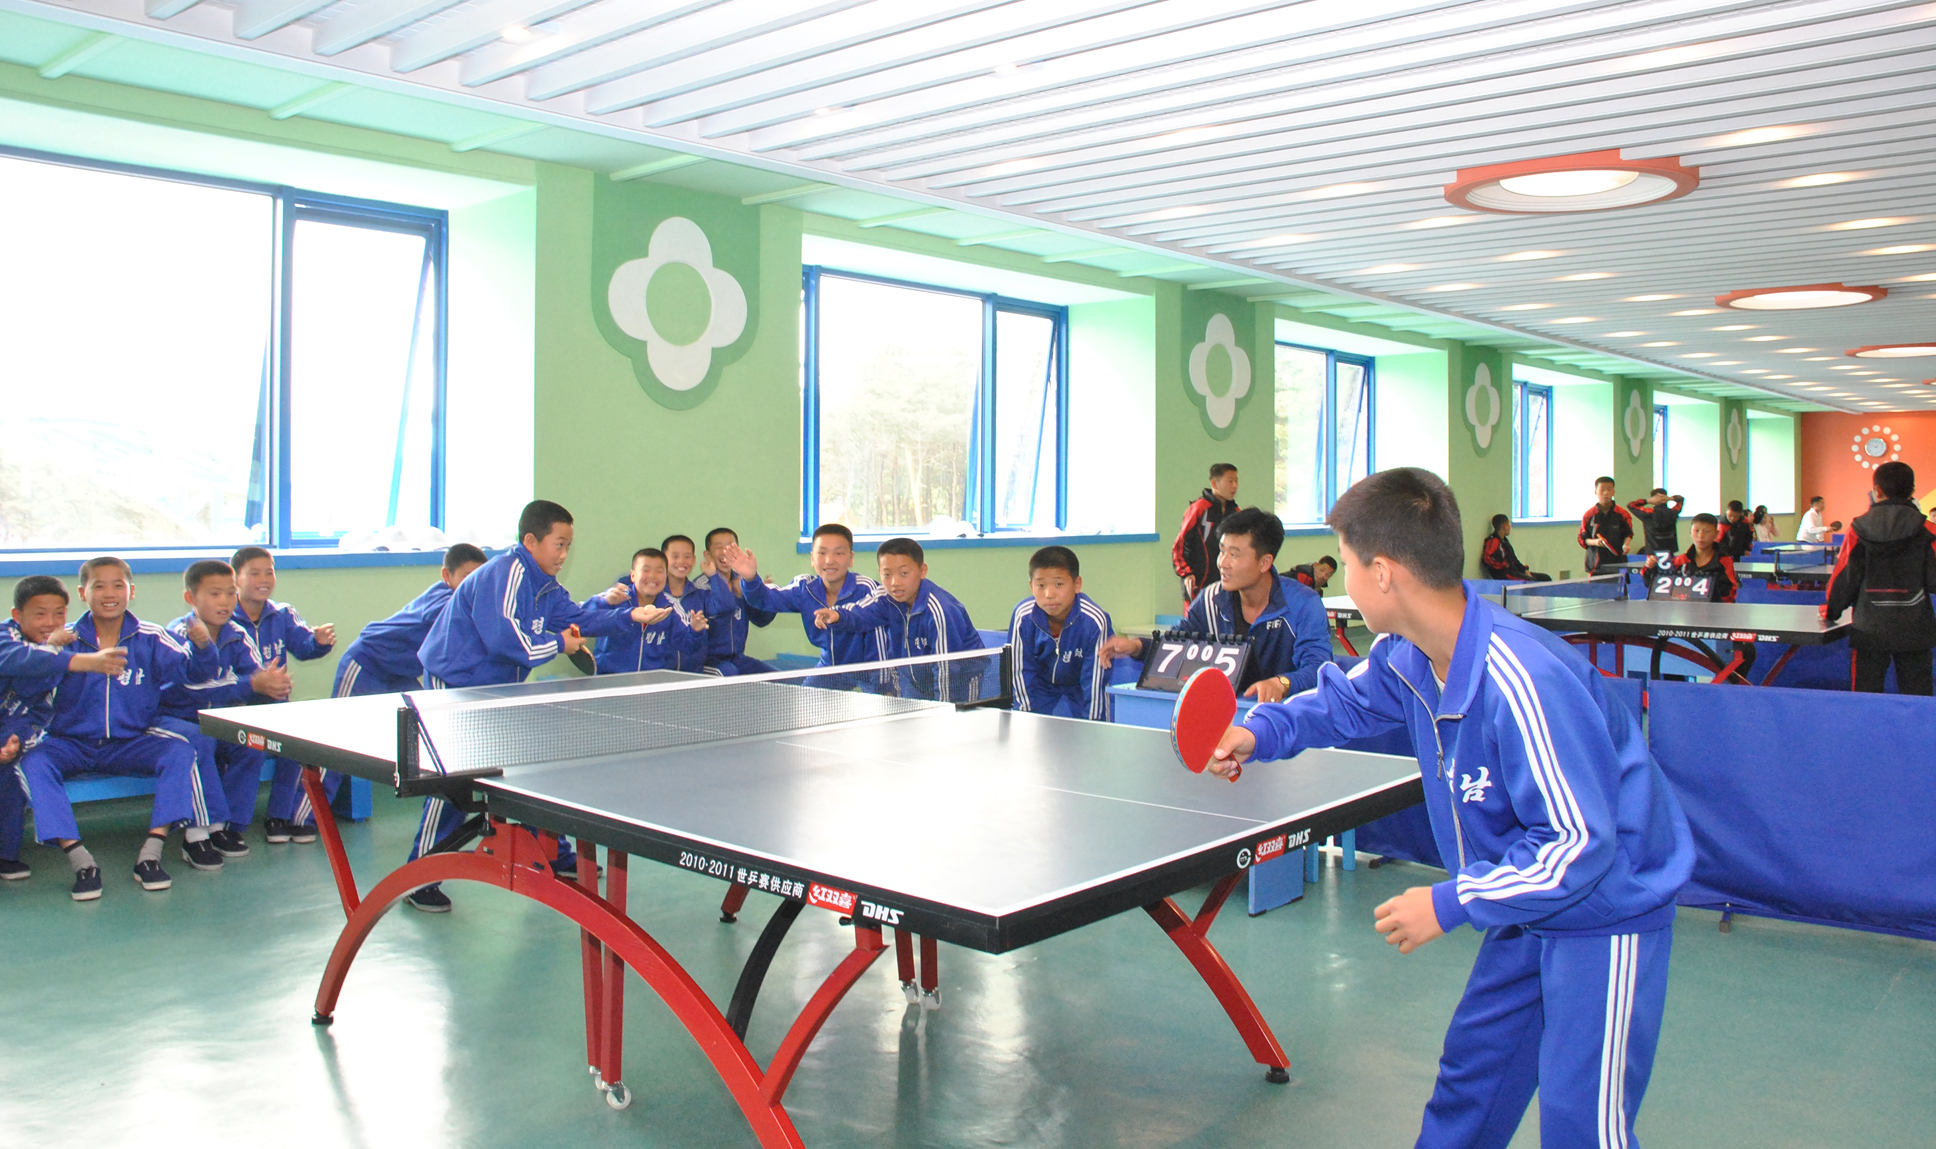 Songdowon International Children S Camp Rooms